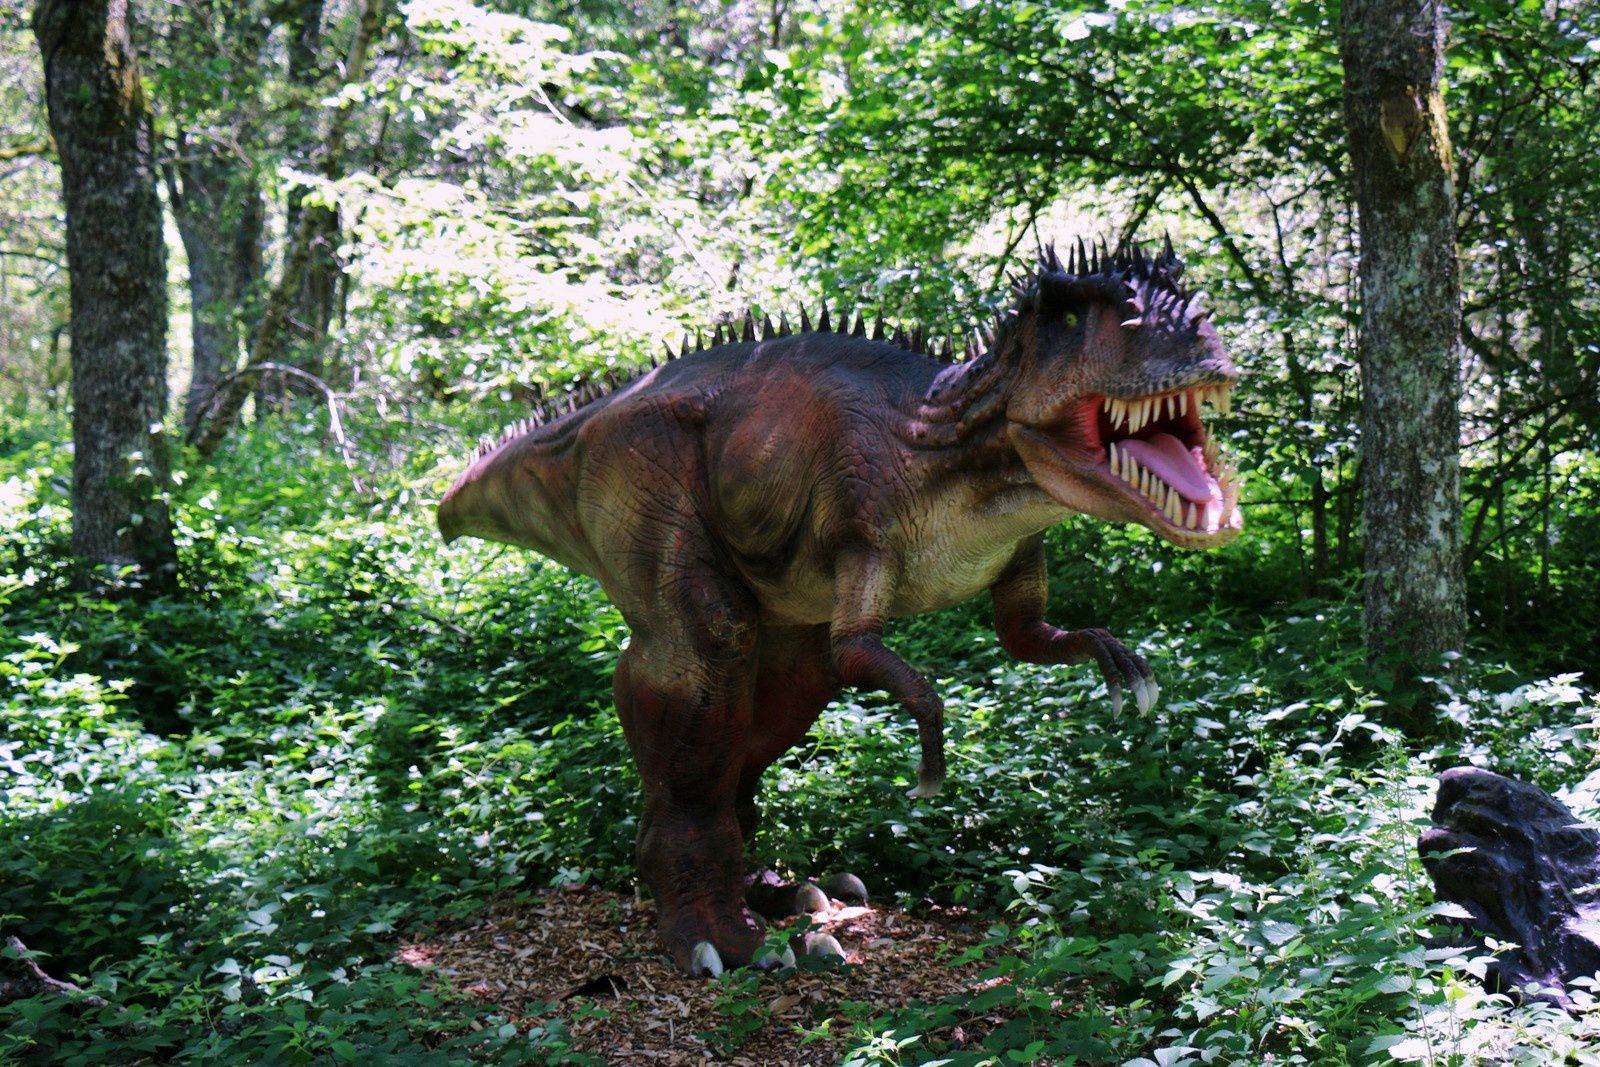 Diplodocus et Ceratosaurus, sur les traces des dinosaures